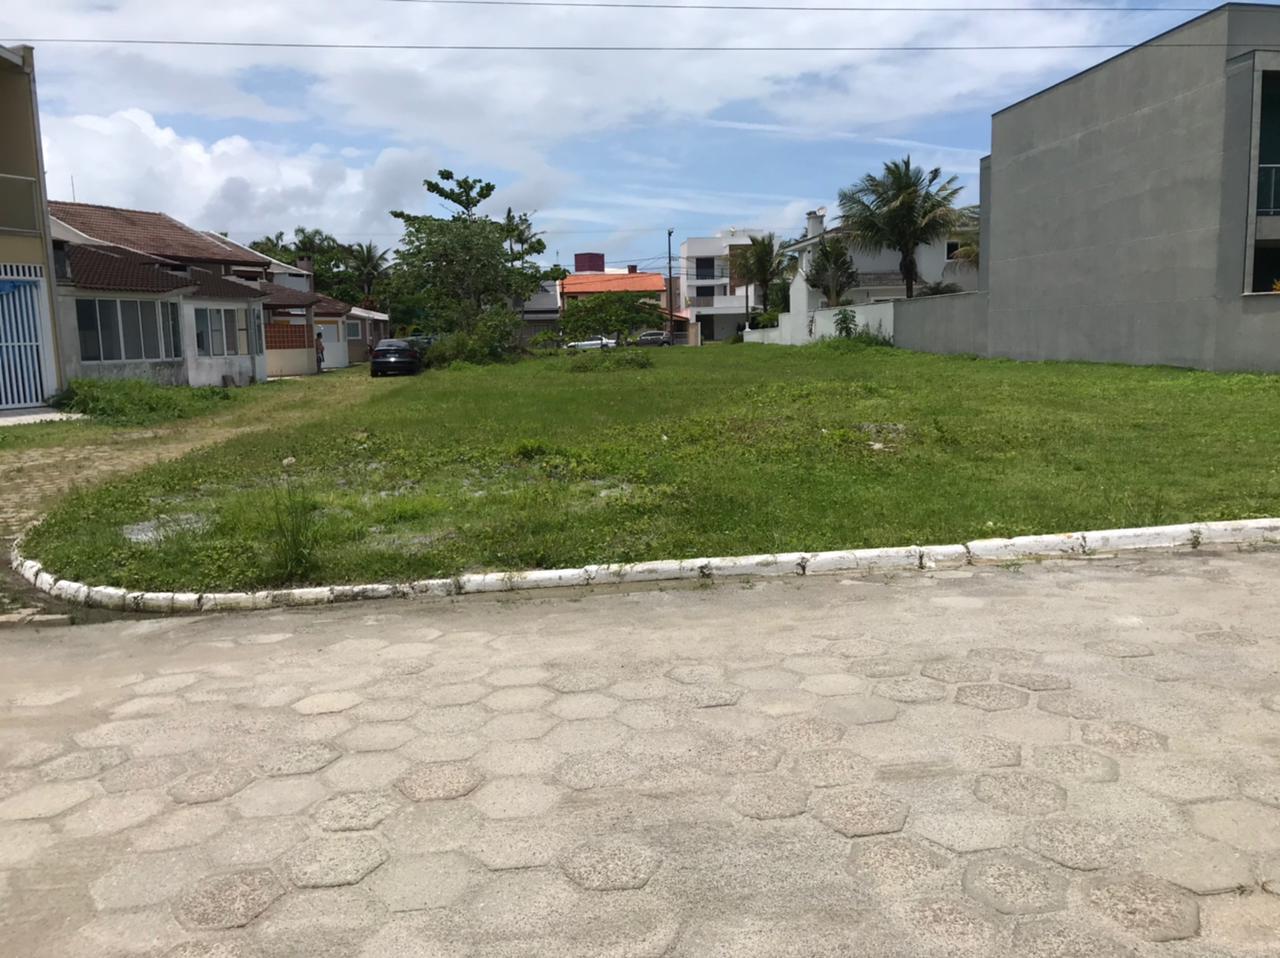 https://s3-sa-east-1.amazonaws.com/static-arbo/TE0016_SAFI/terrenoavendaataminortepontaldoparanapr_1612904126641.jpg